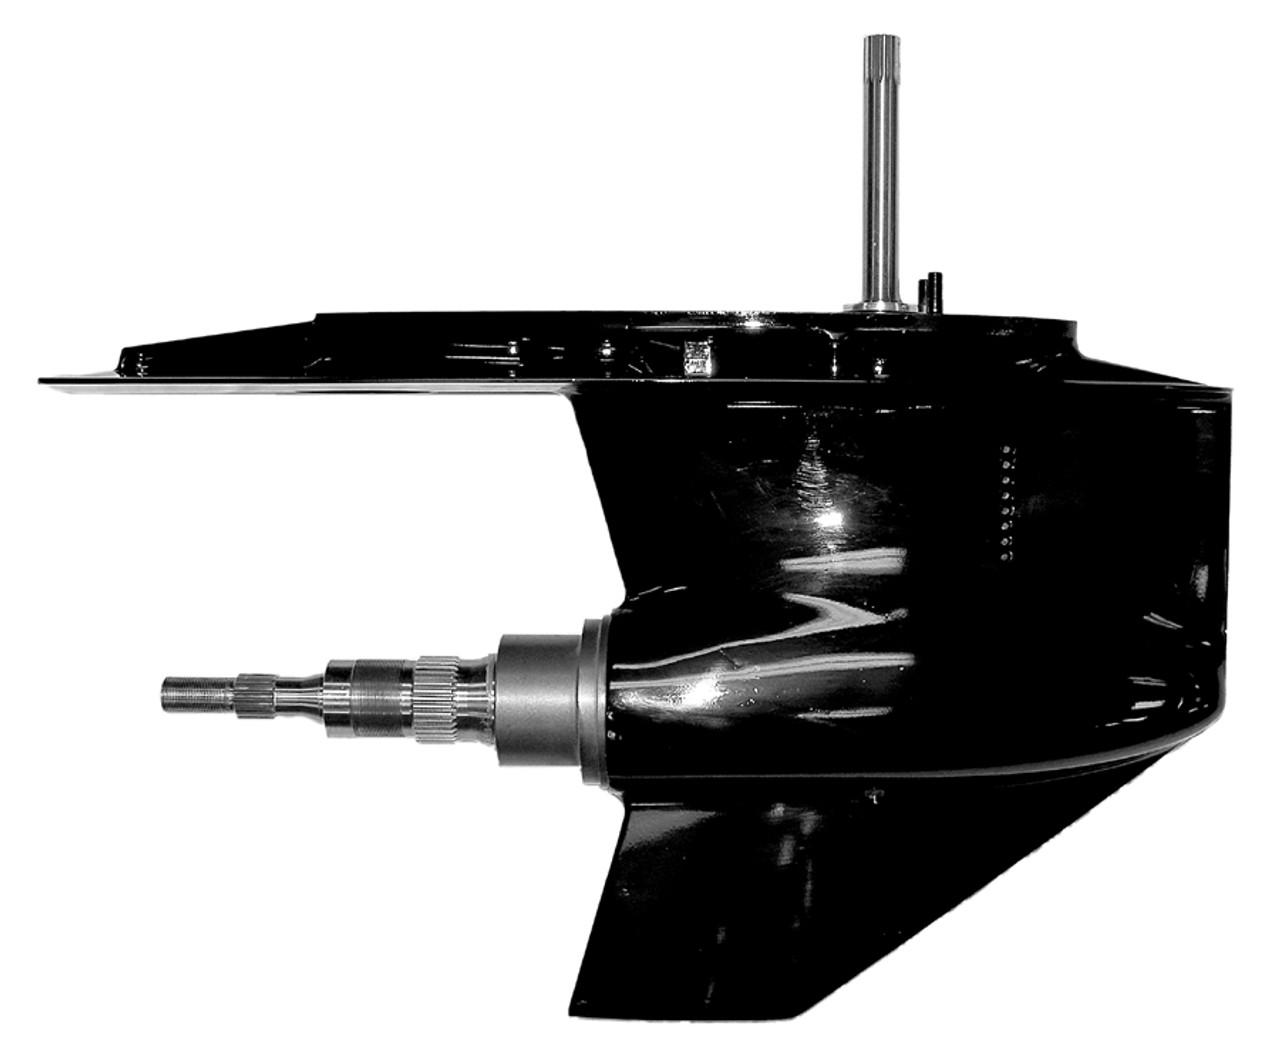 Remanufactured Mercruiser Bravo III Lower Drive Shaft Assembly [1995-2018]